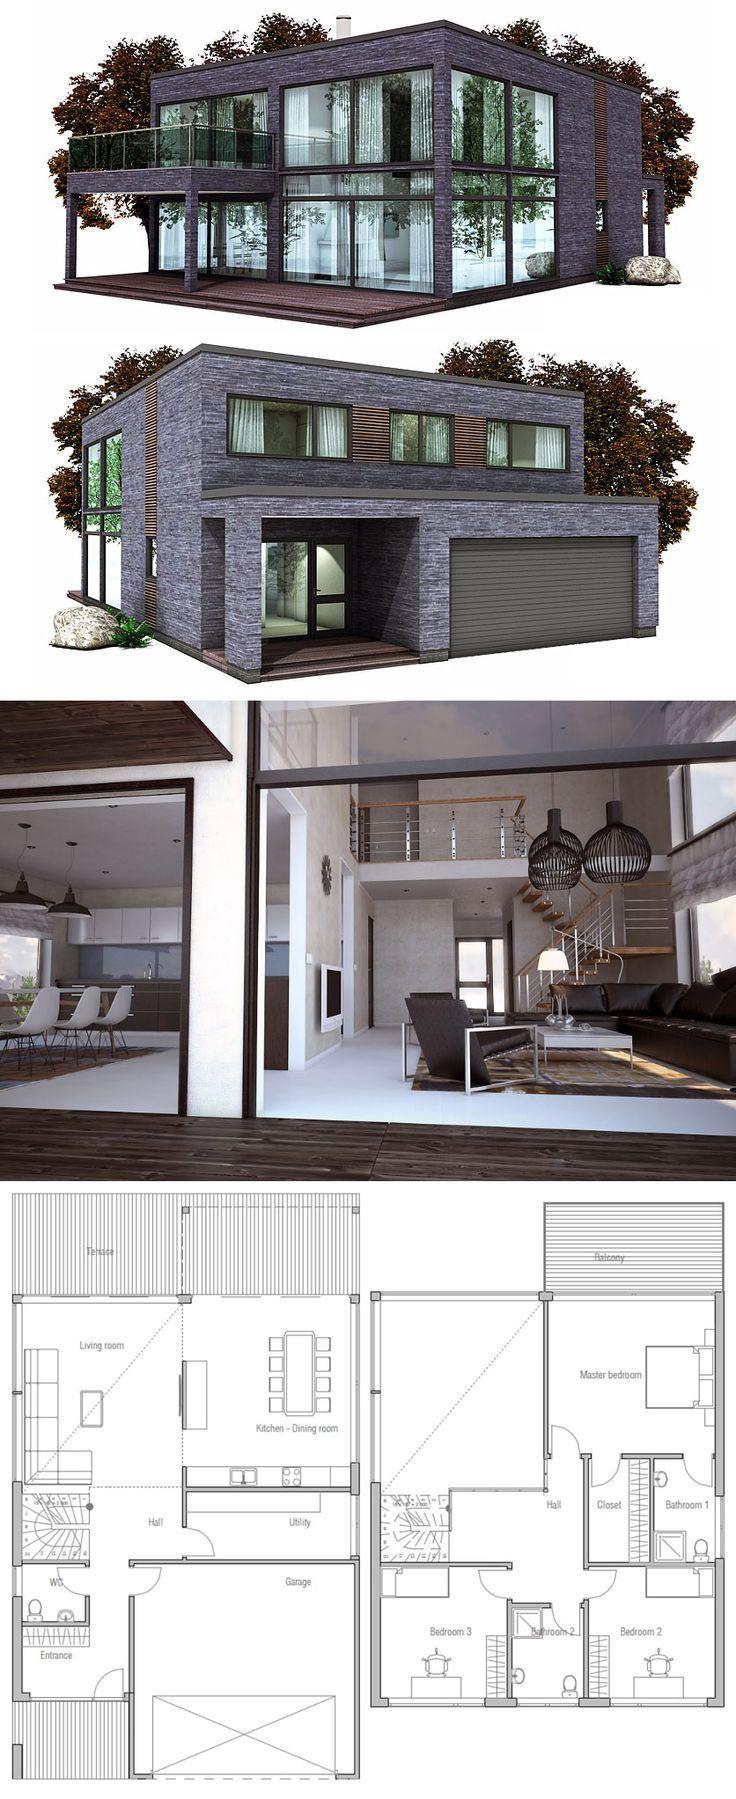 Patios &Chimneys | Sim House Ideas | Minimalist house design ... on zillow bedroom designs, zillow living room designs, zillow bathroom designs,